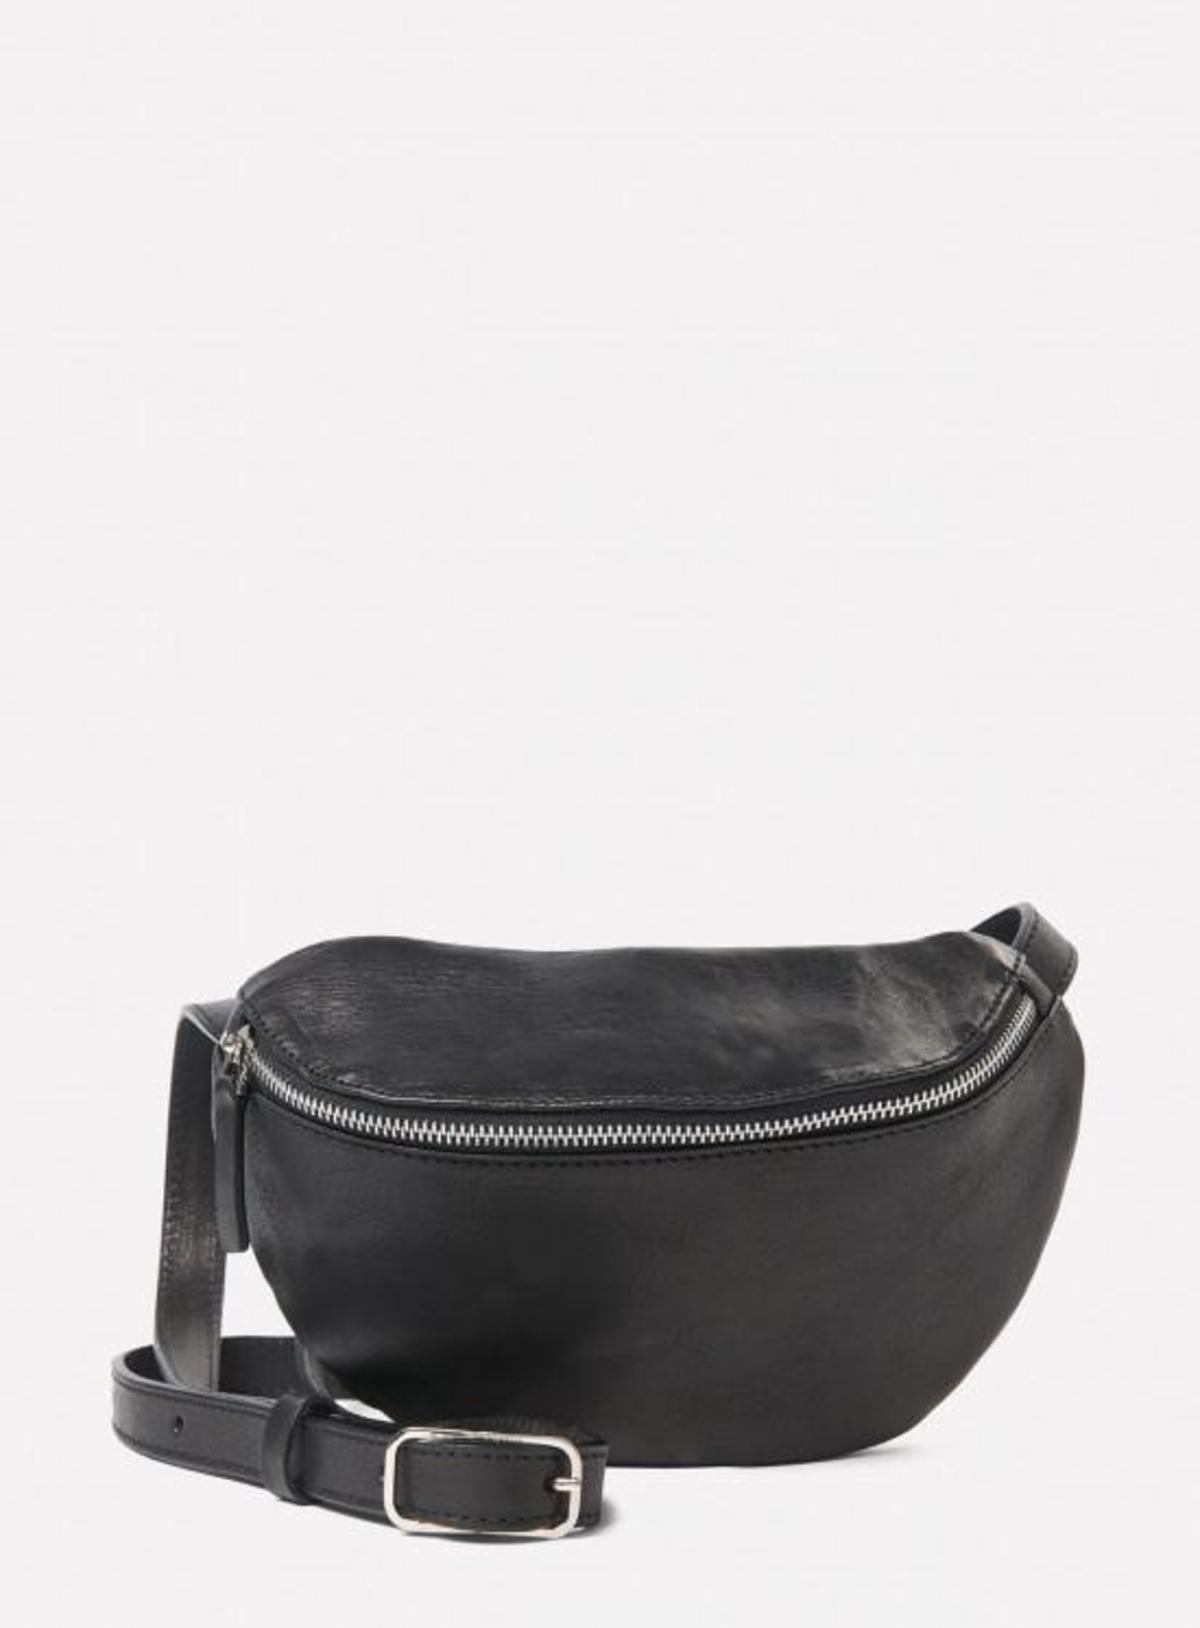 06e1c8f678 zamt Hip bag - black